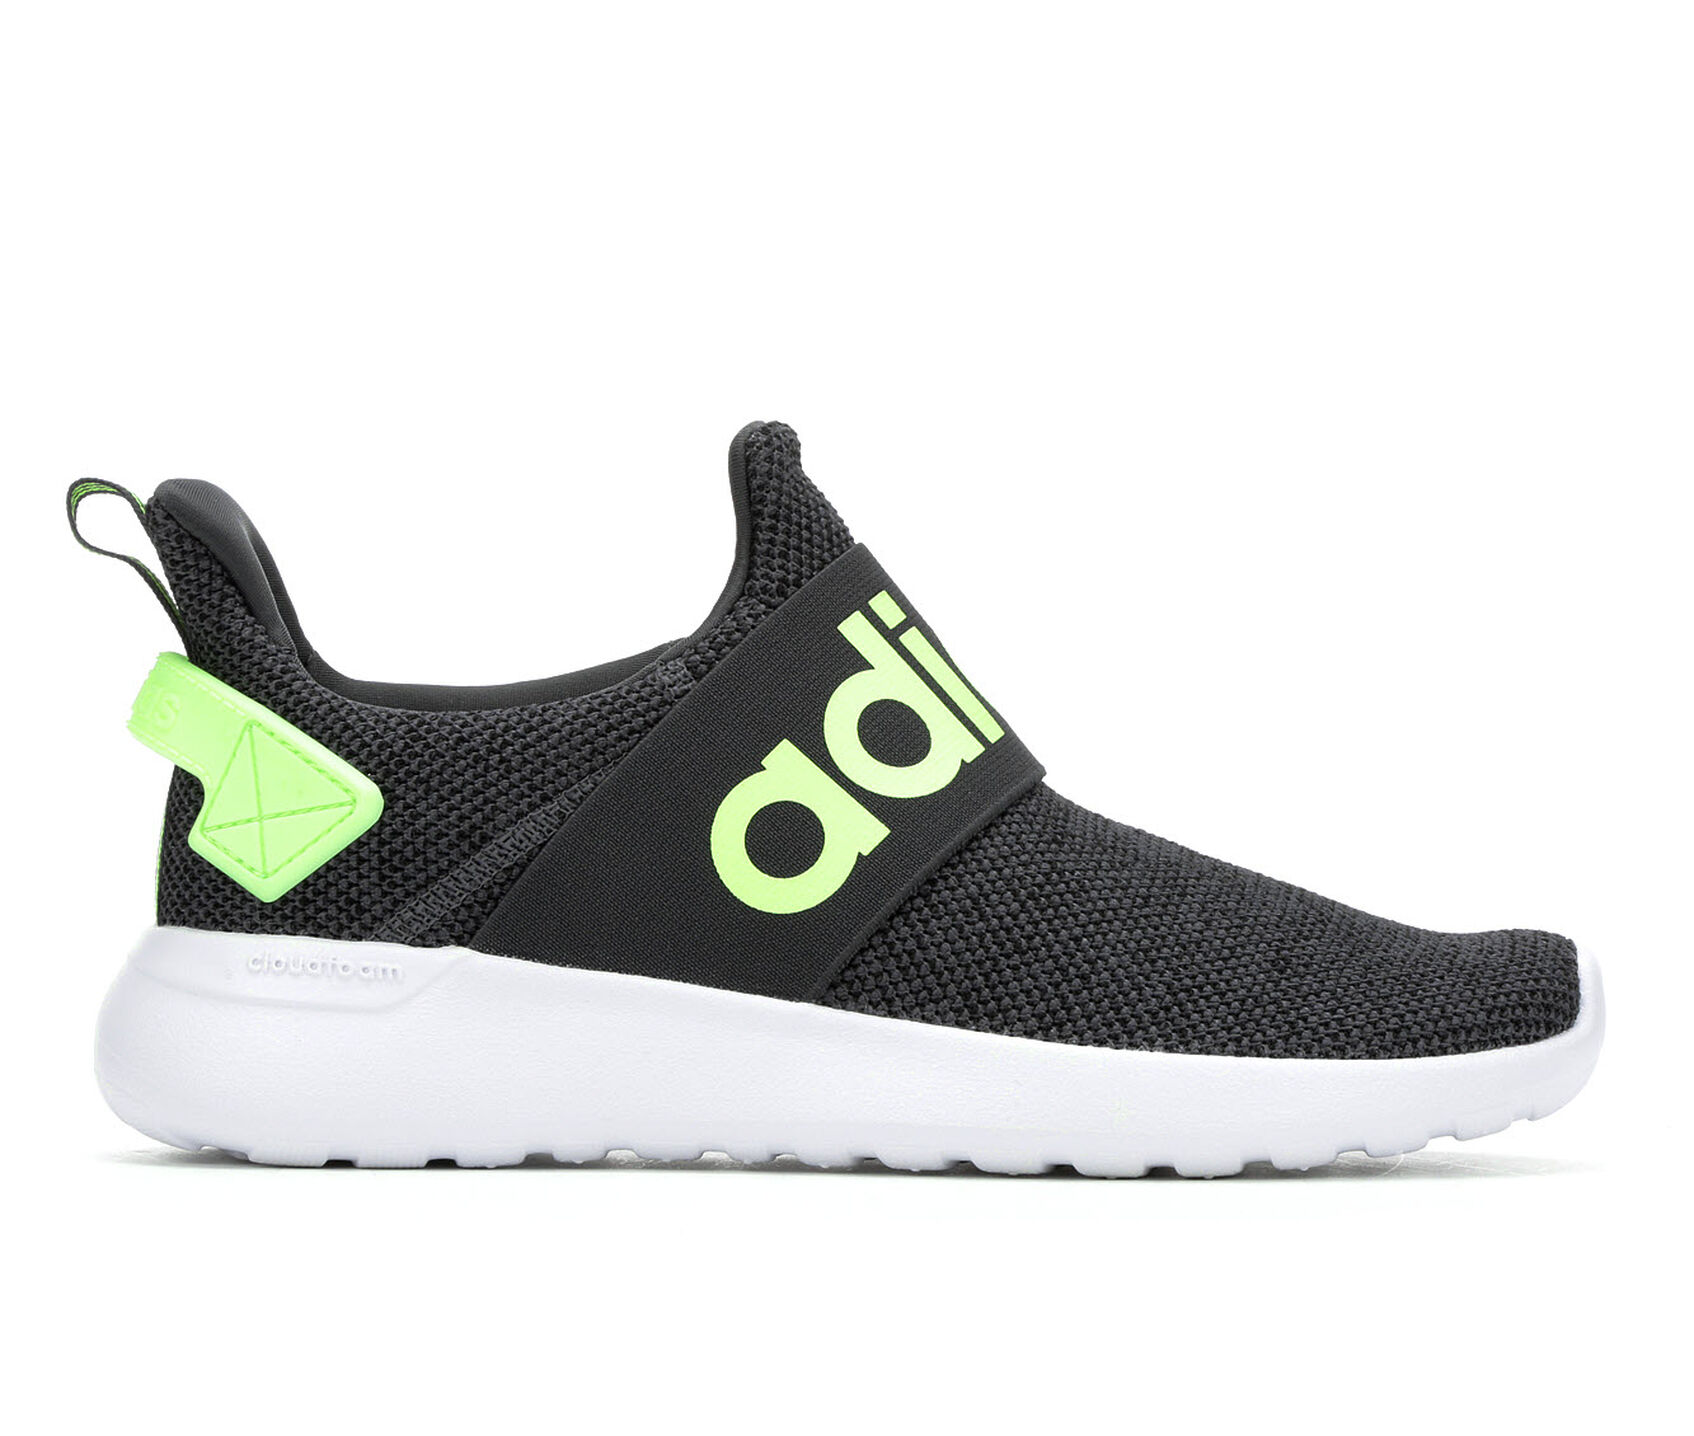 acheter populaire 09e00 d2345 Boys' Adidas Little Kid & Big Kid Lite Racer Adapt Running Shoes